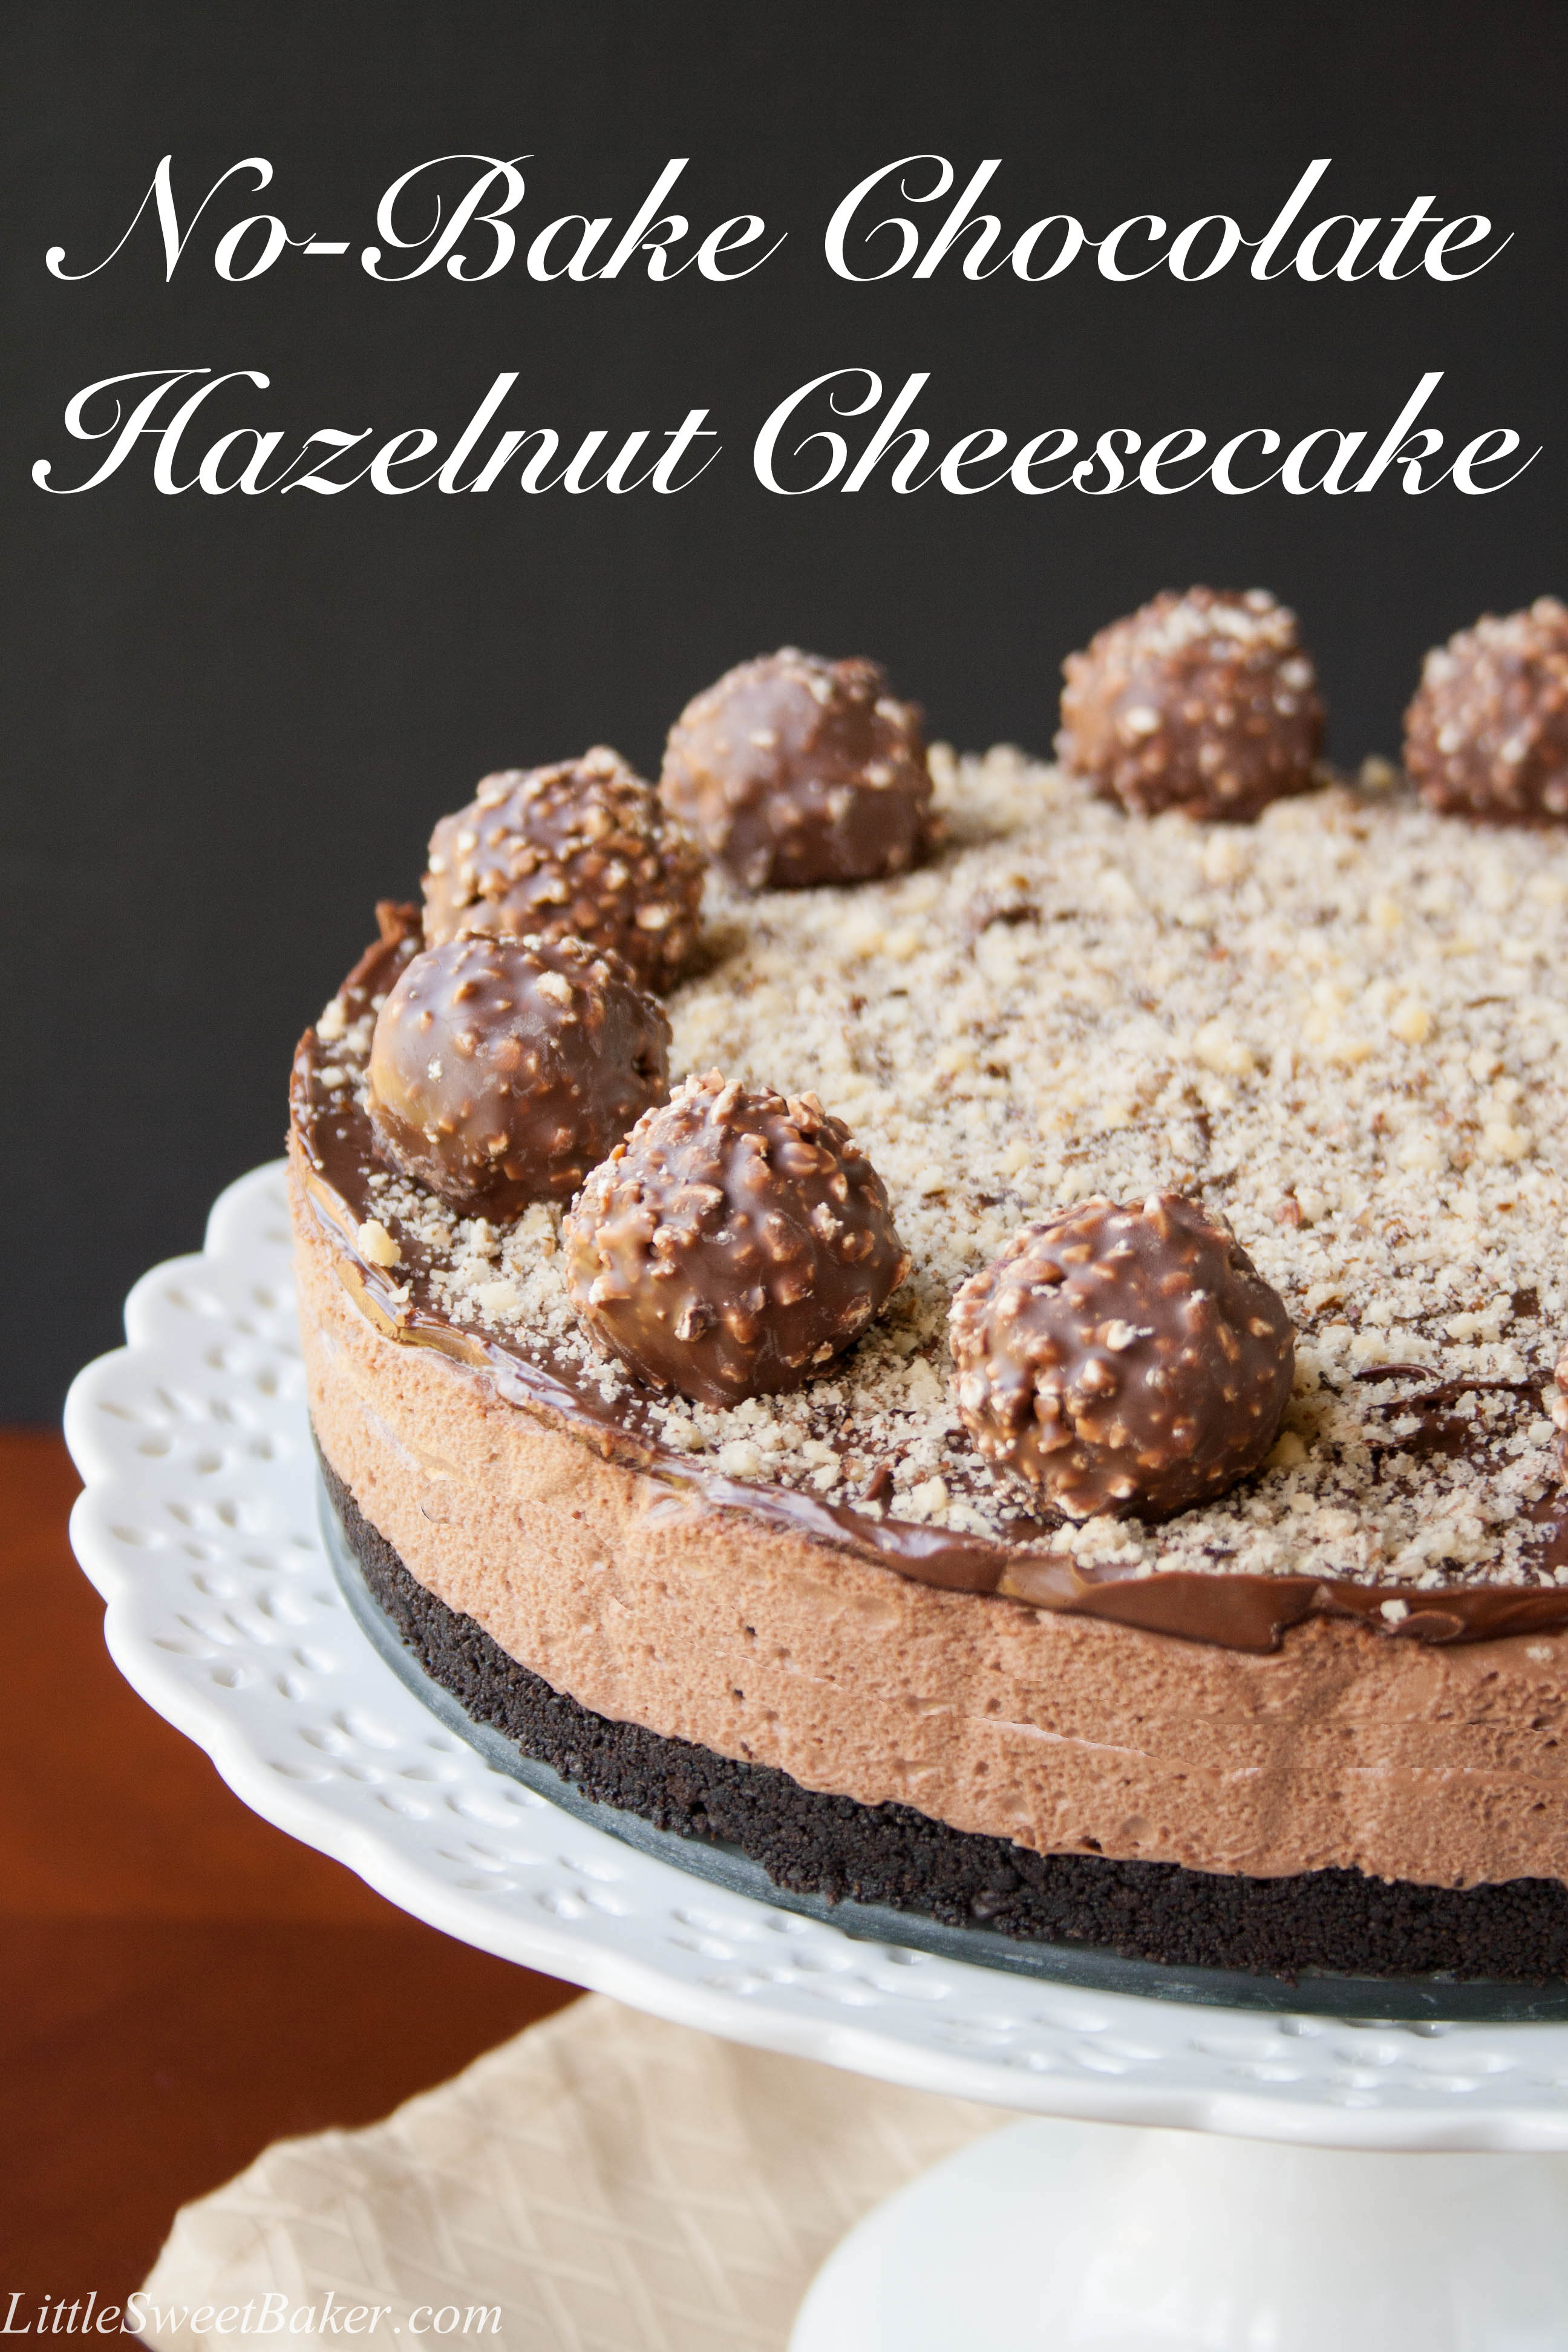 NO-BAKE CHOCOLATE HAZELNUT CHEESECAKE. Oreo cookie crumb base with a ...